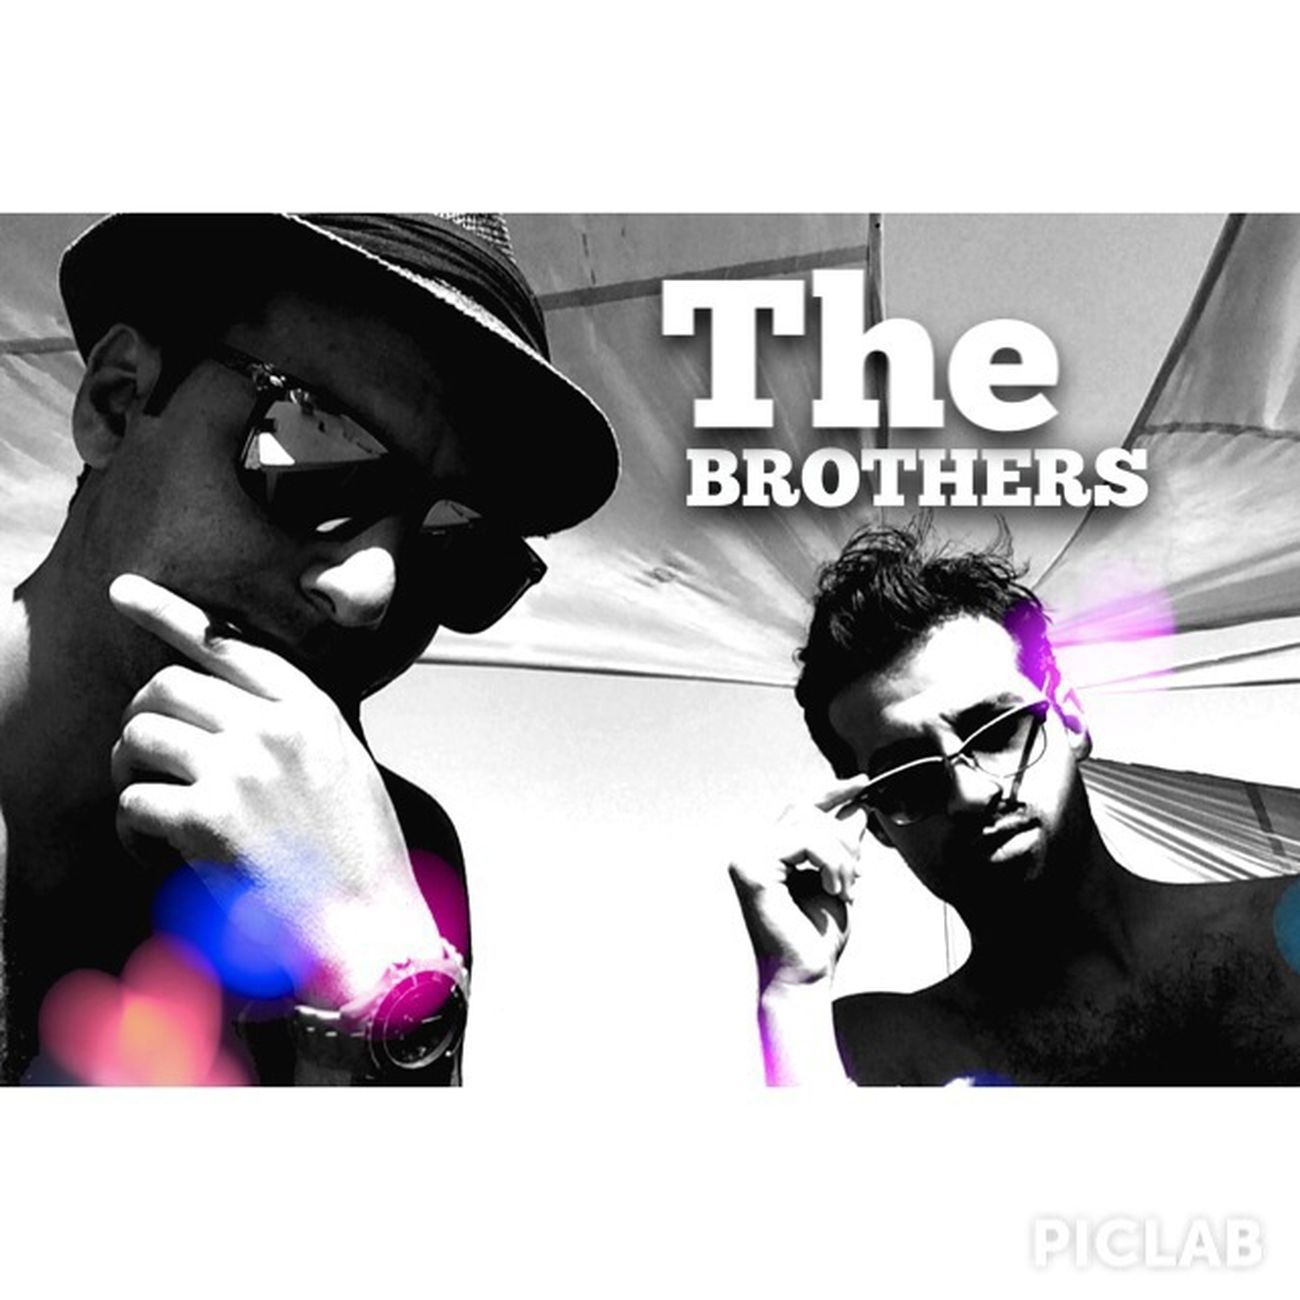 me&my Bro